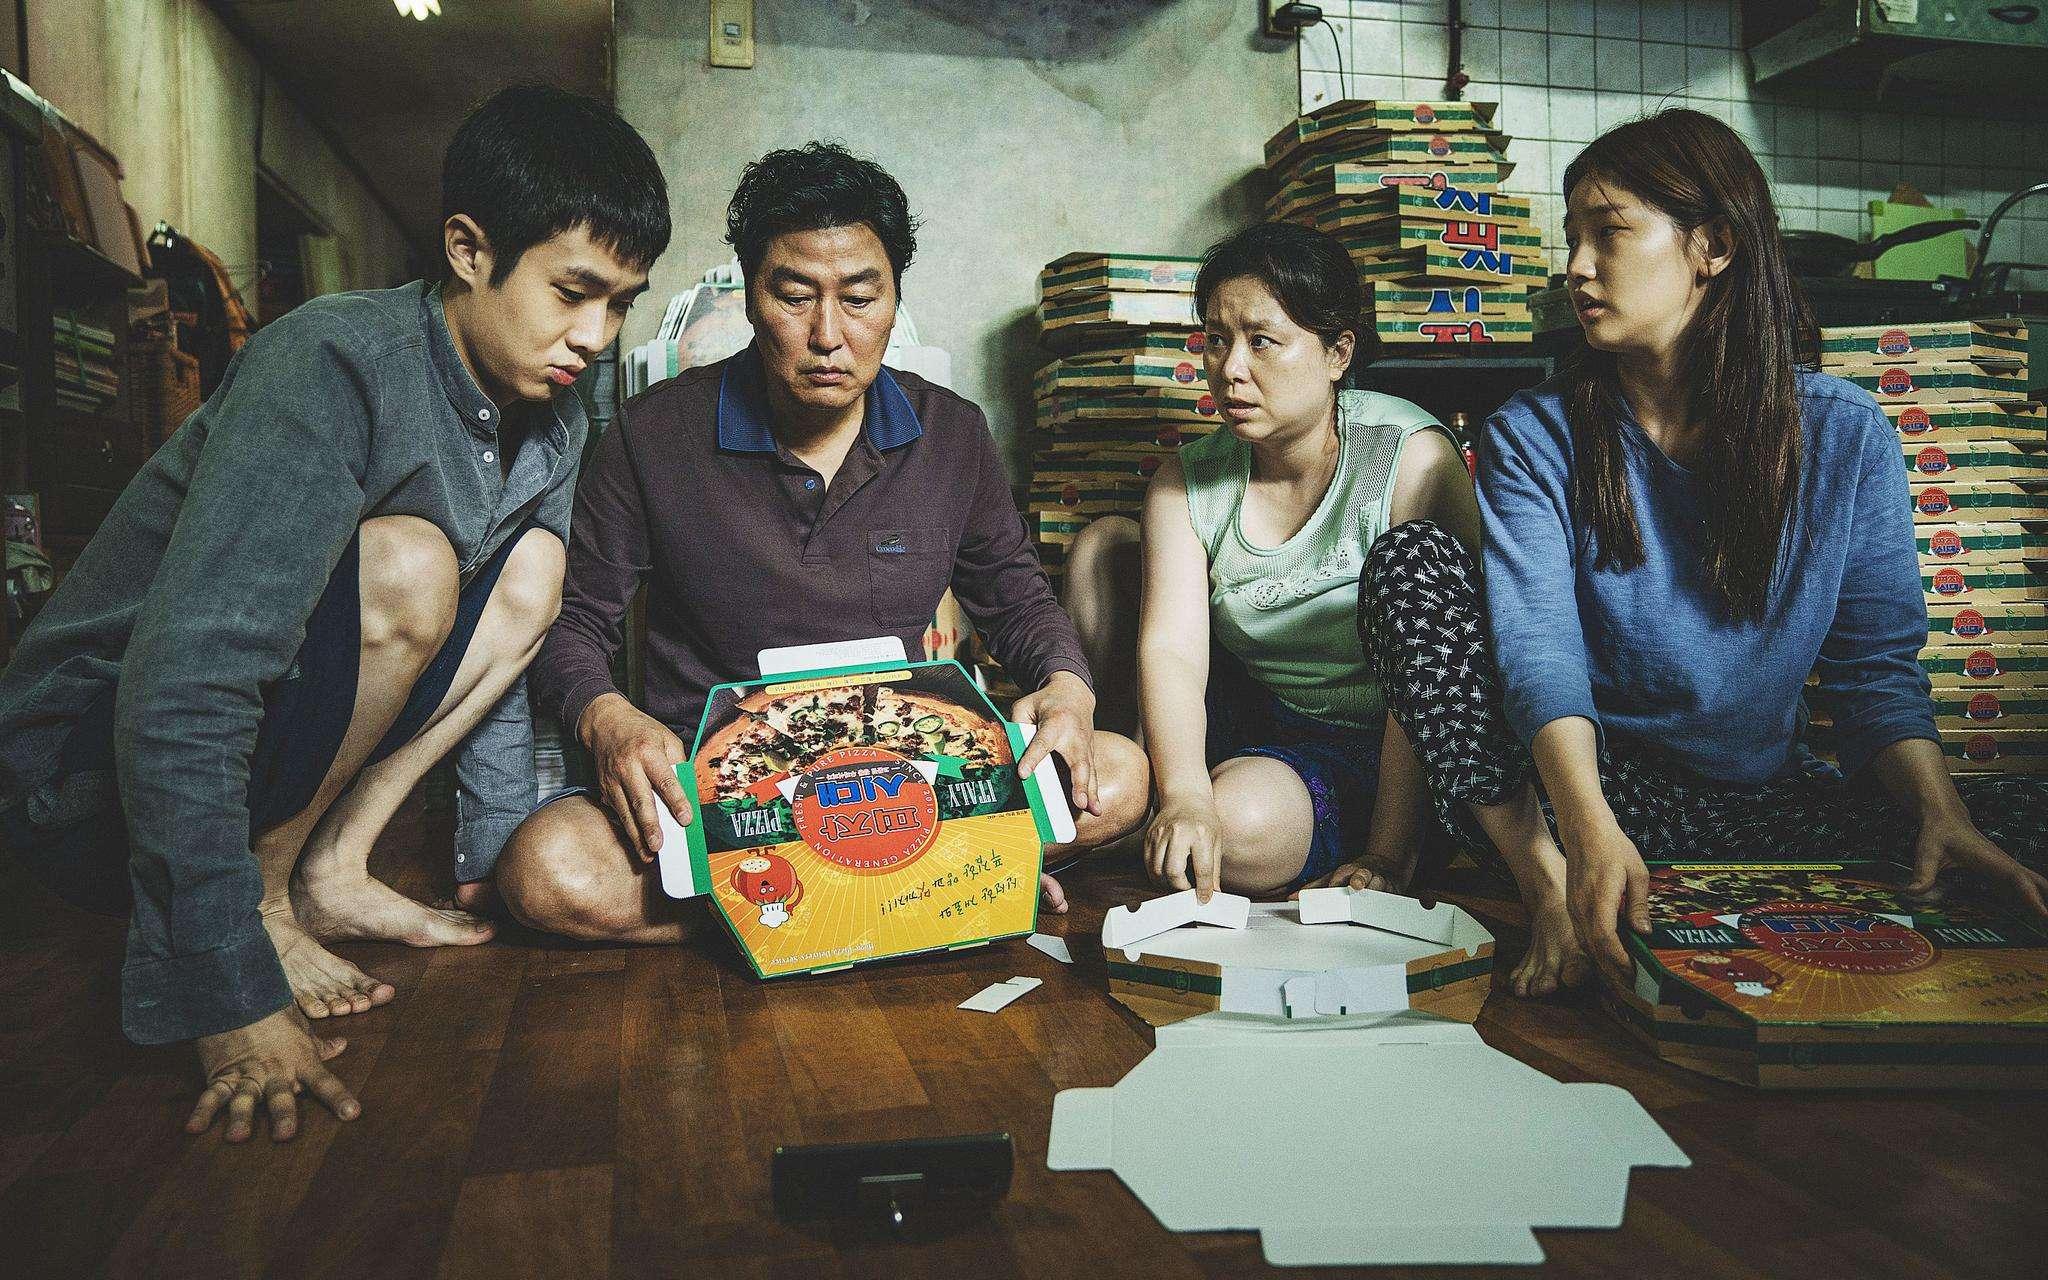 <b>奥斯卡发布最佳外语片短名单 《寄生虫》入围《哪吒》《扫毒2》落选</b>